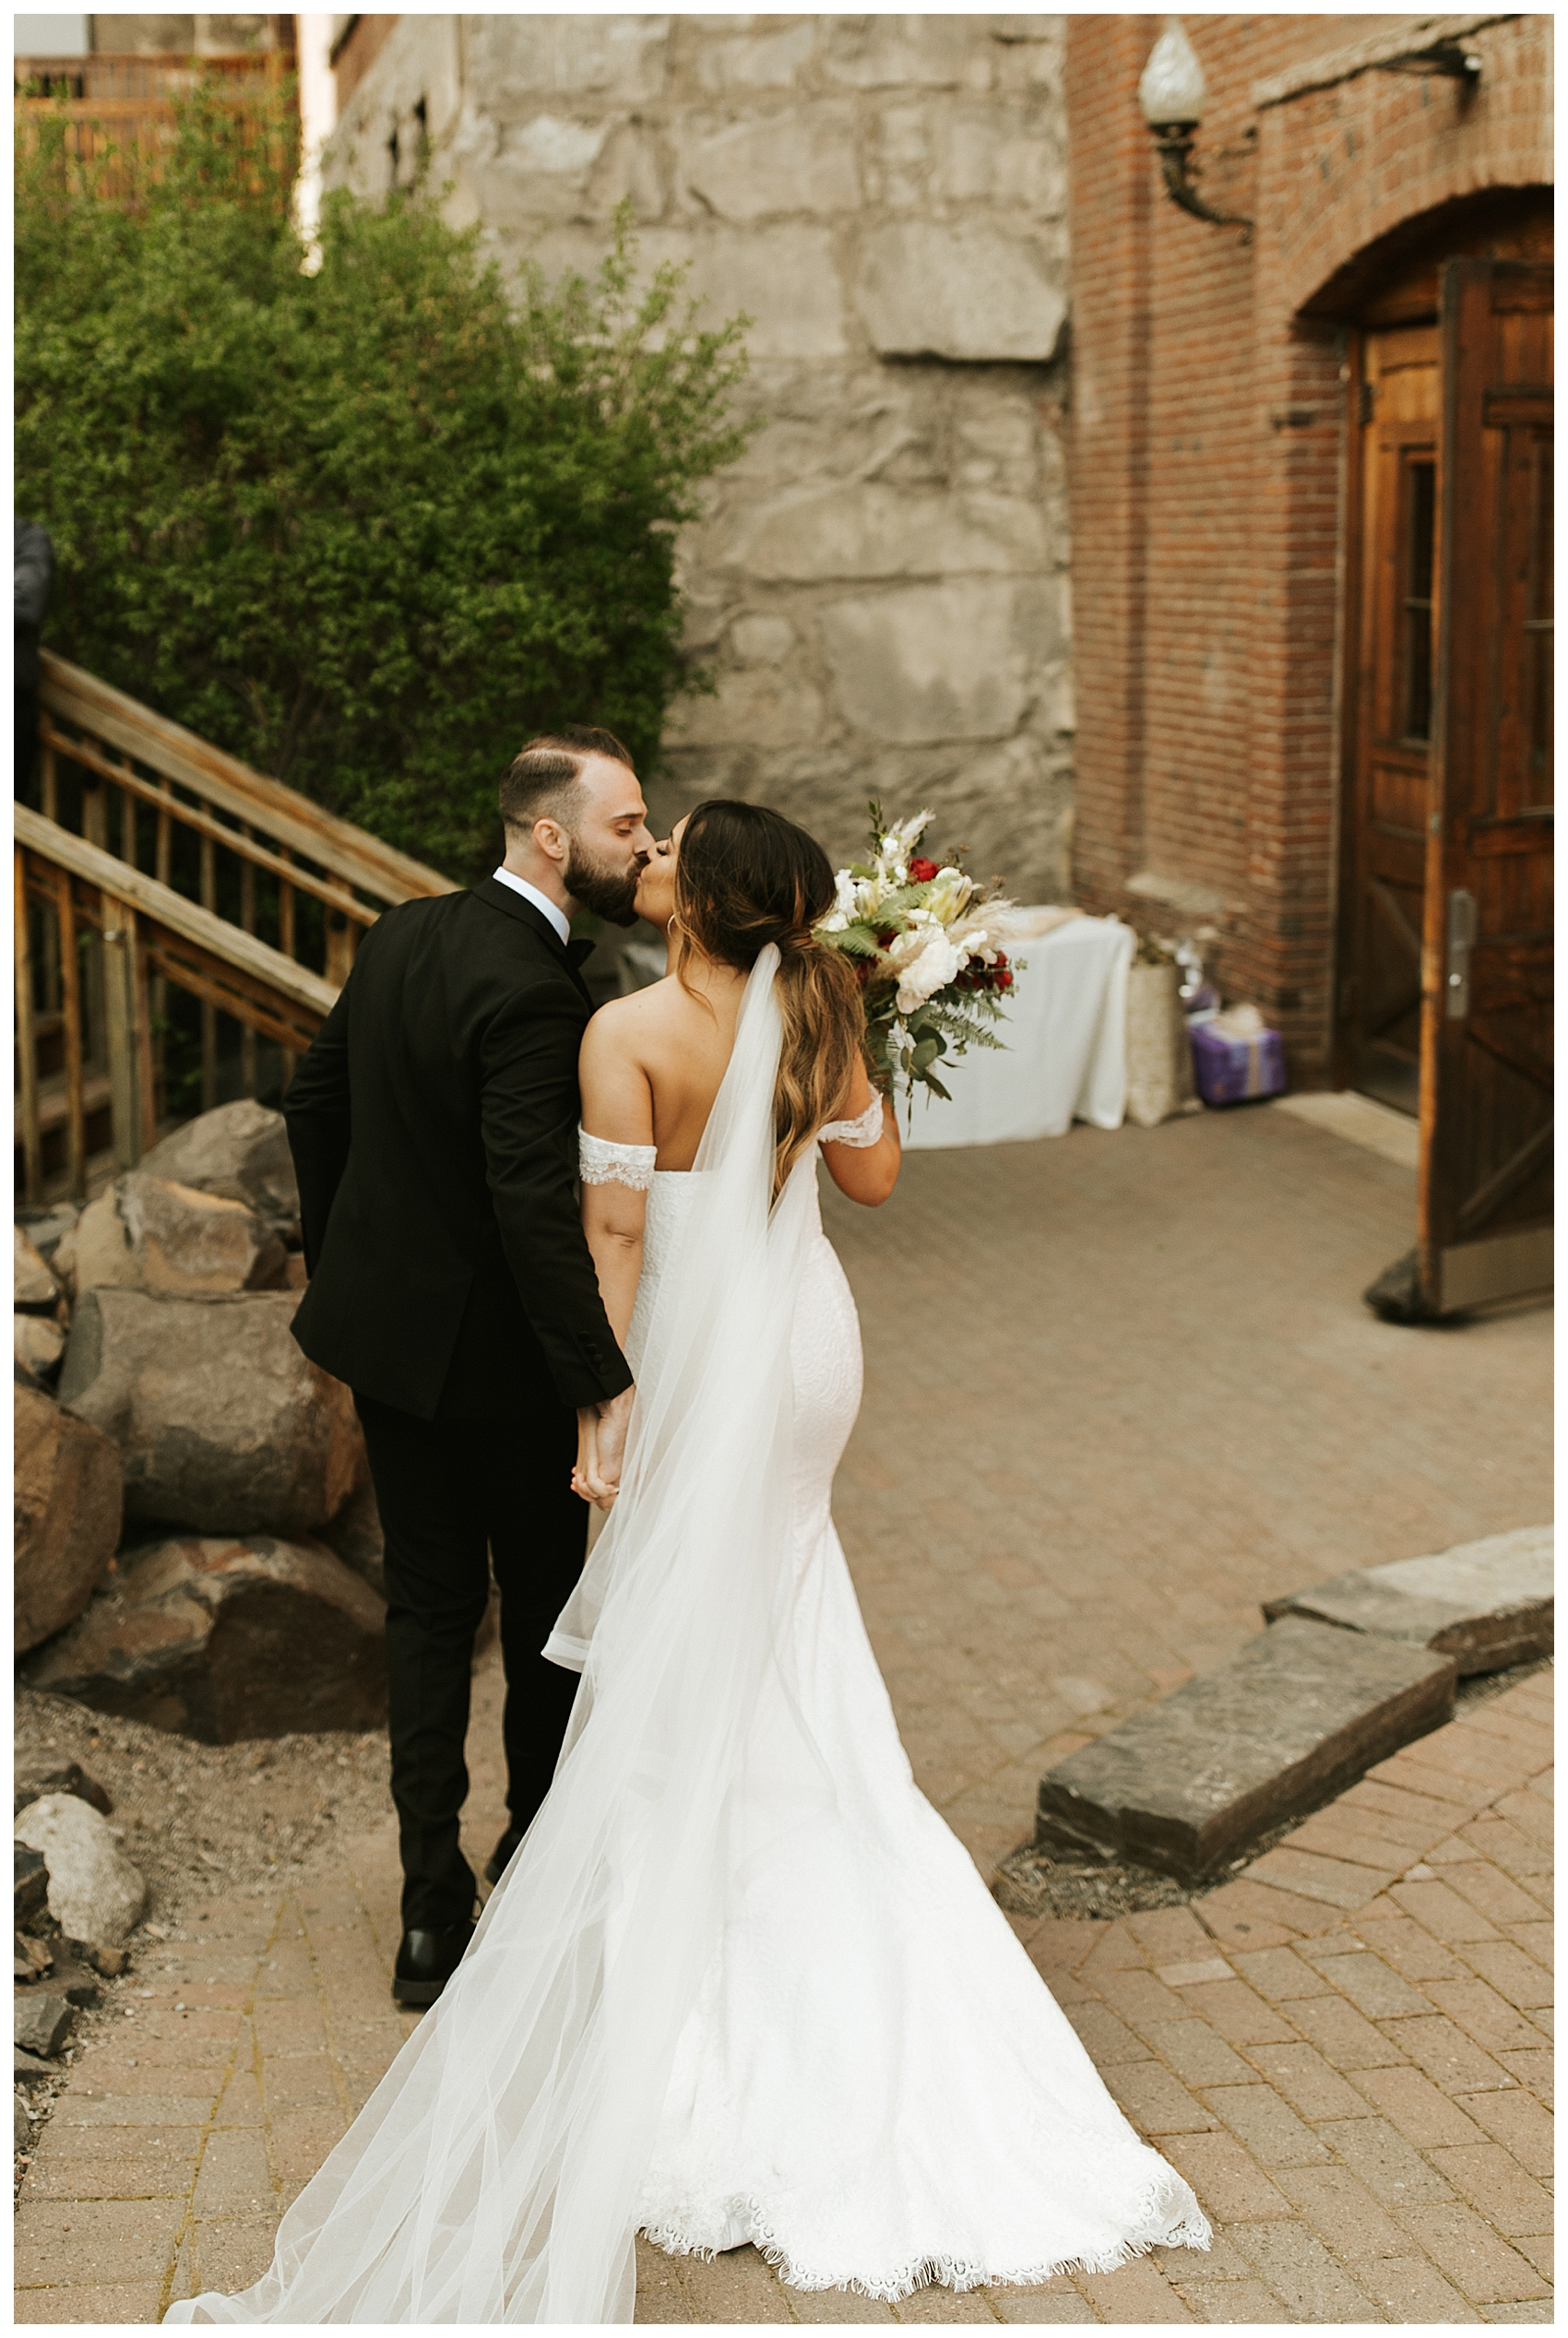 Chateau Rive Spokane Wedding Cassie Trottier Photography01062.jpg